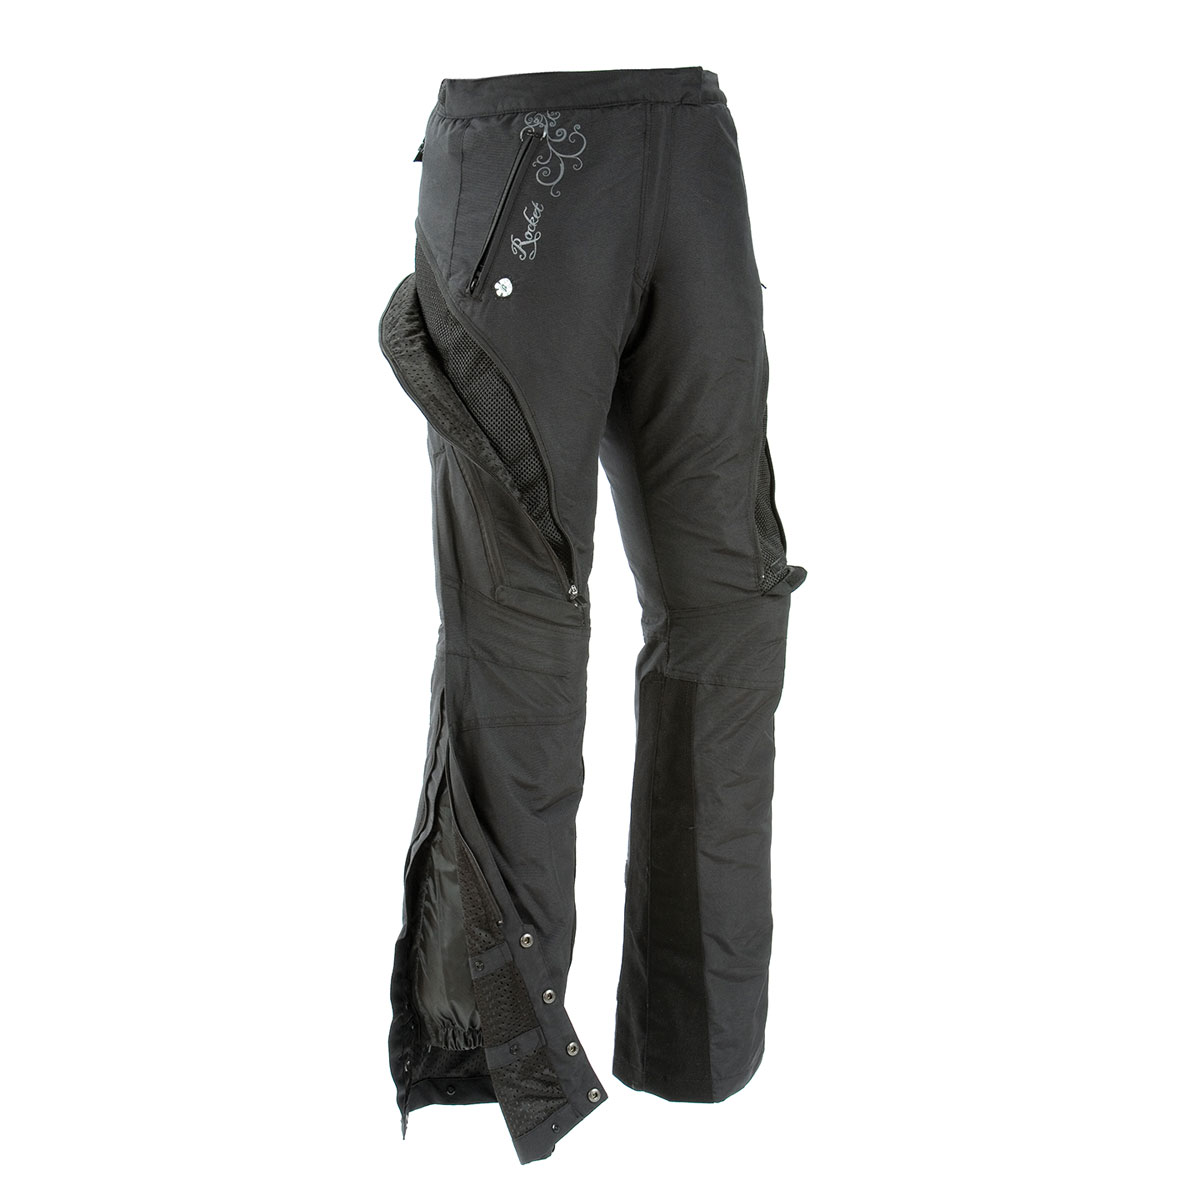 Joe Rocket Women's Alter Ego Black Pants